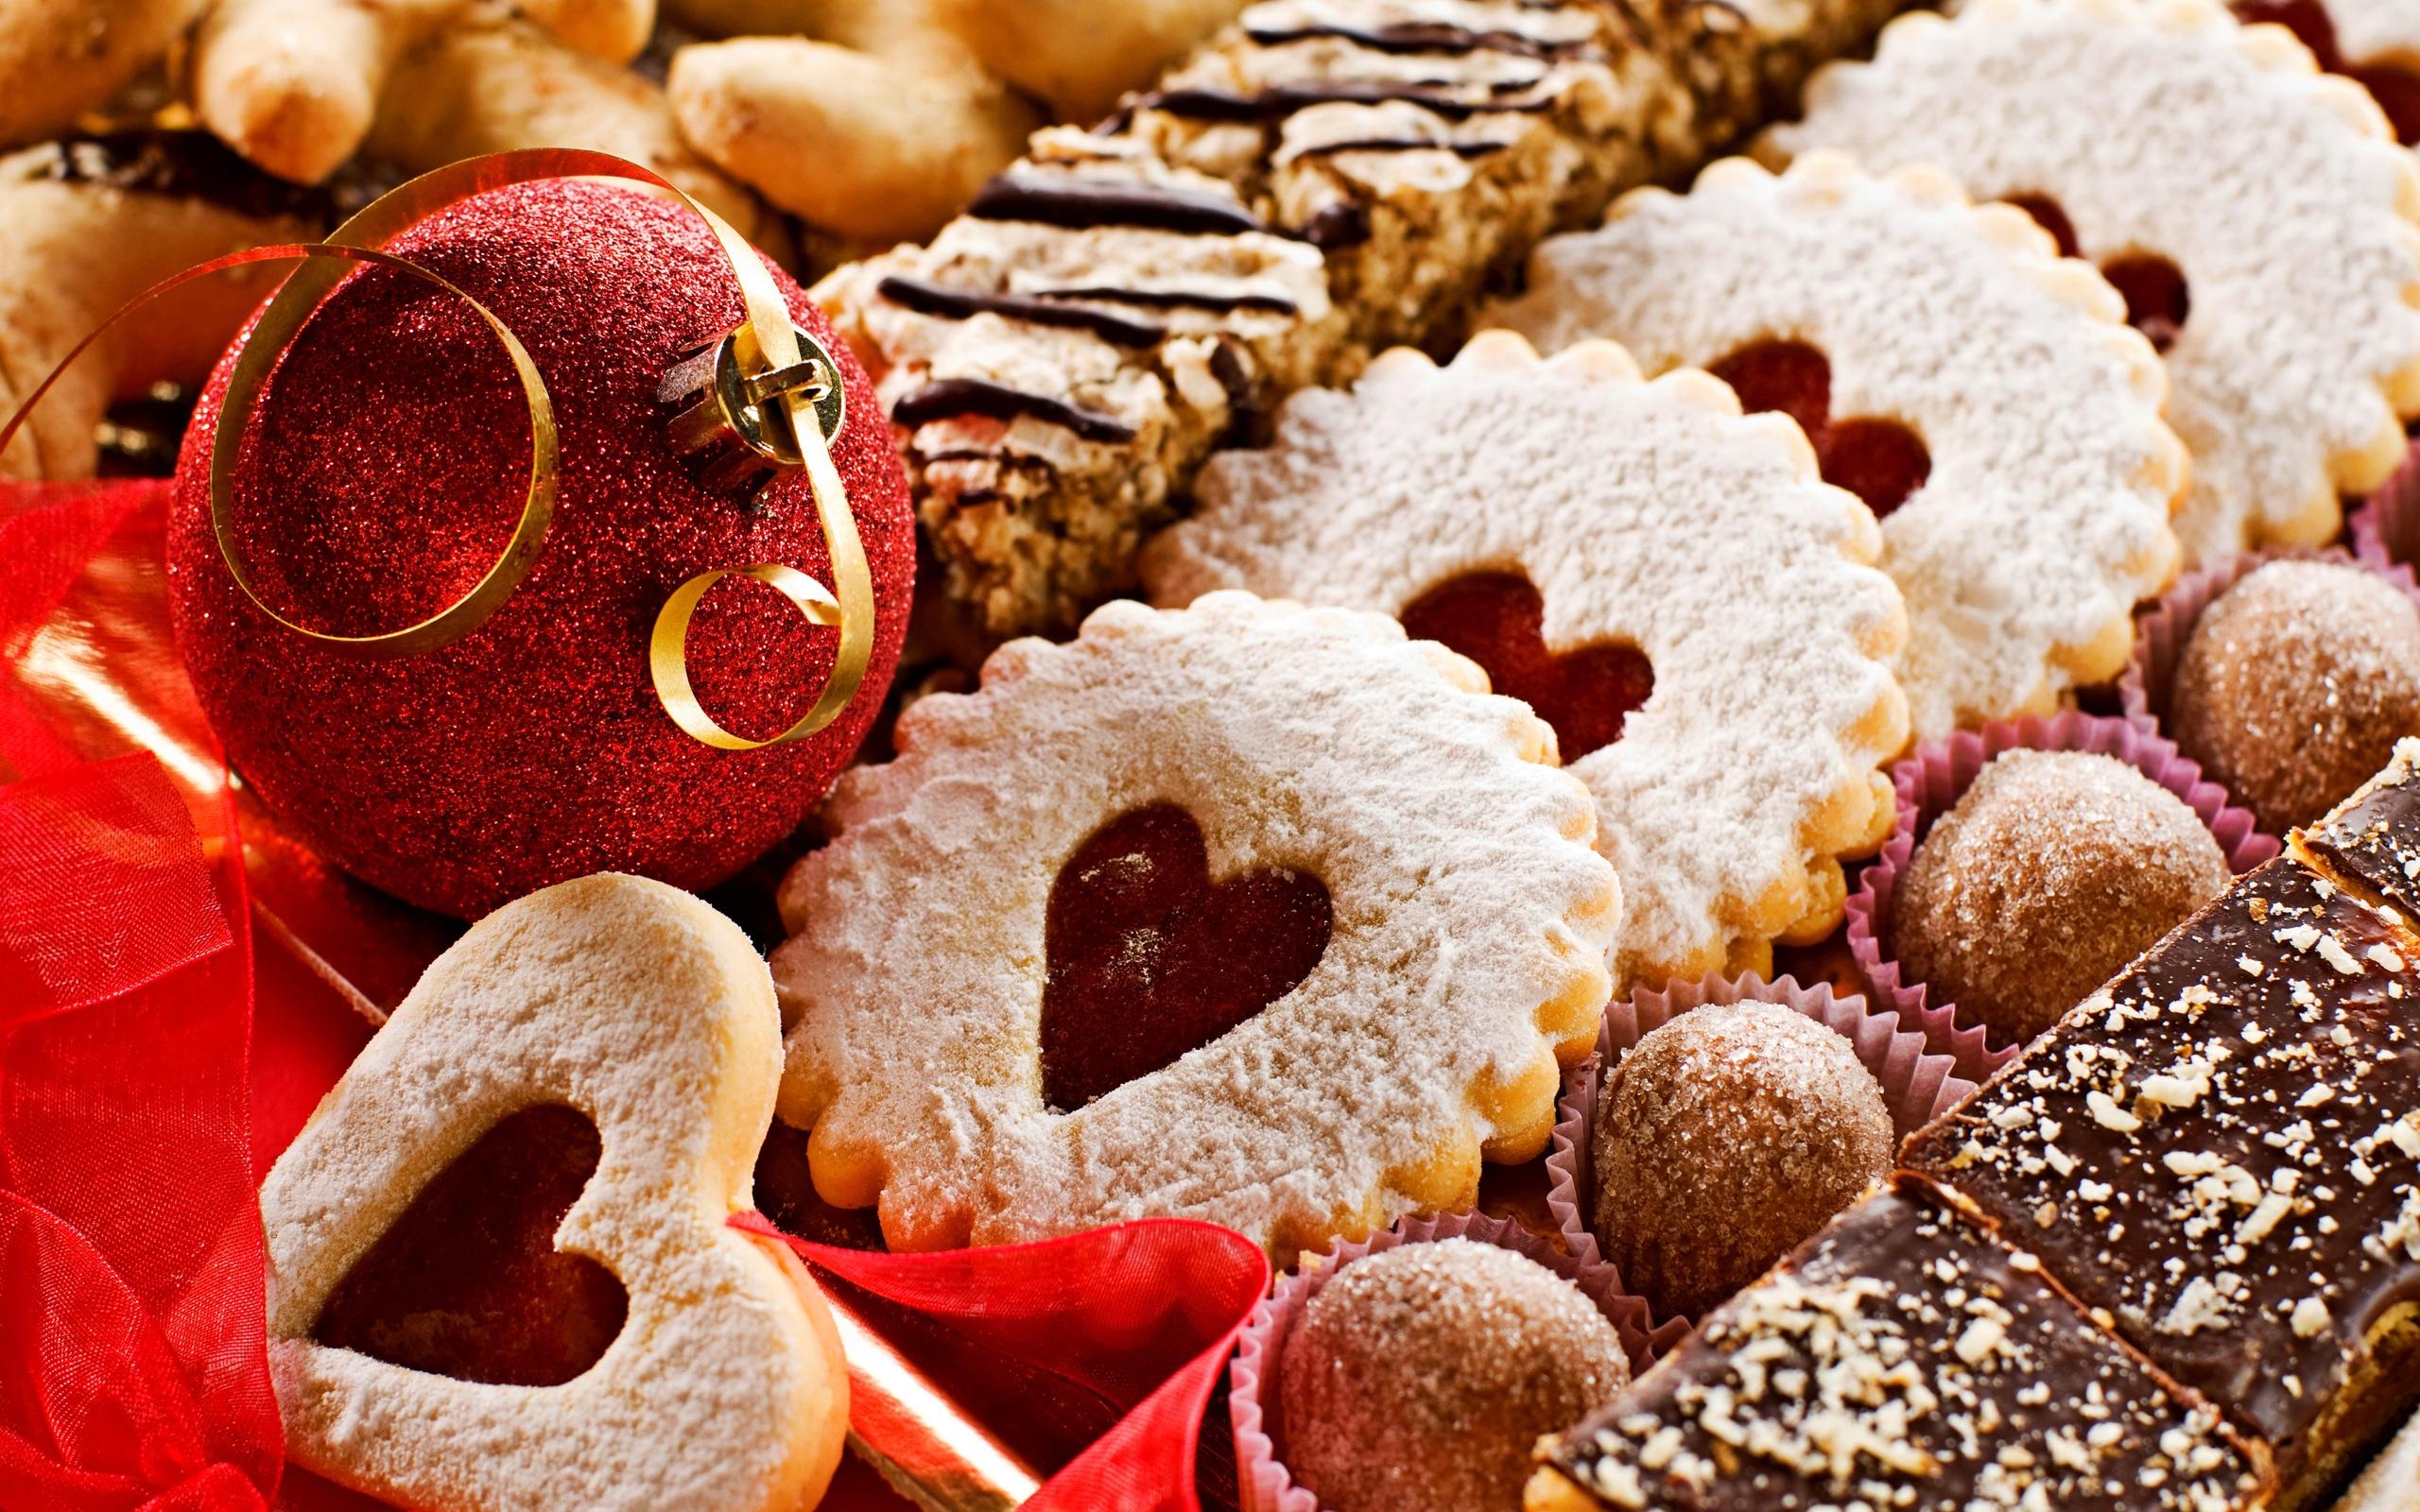 More Food & Drinks Desktop Wallpapers - Christmas Cookies Wallpaper Wide , HD Wallpaper & Backgrounds